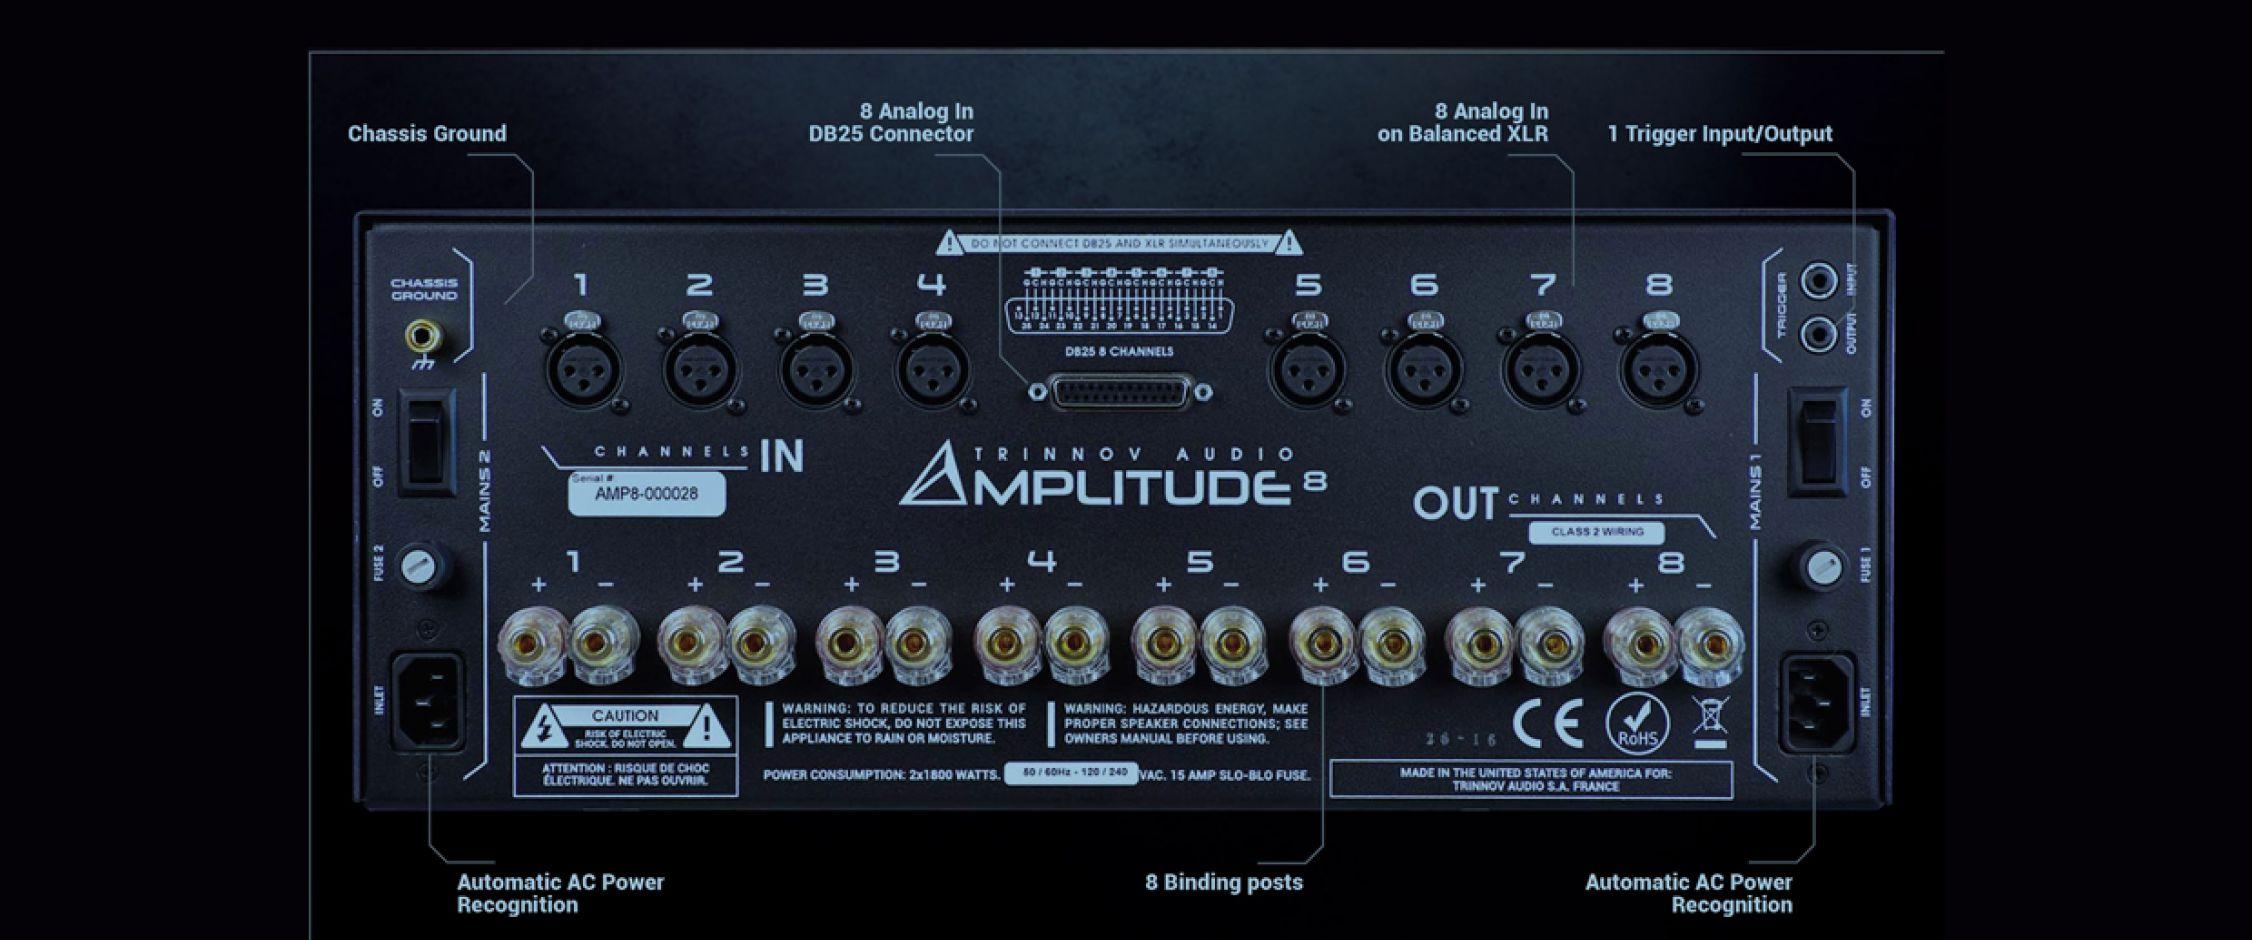 amplitude 8_back